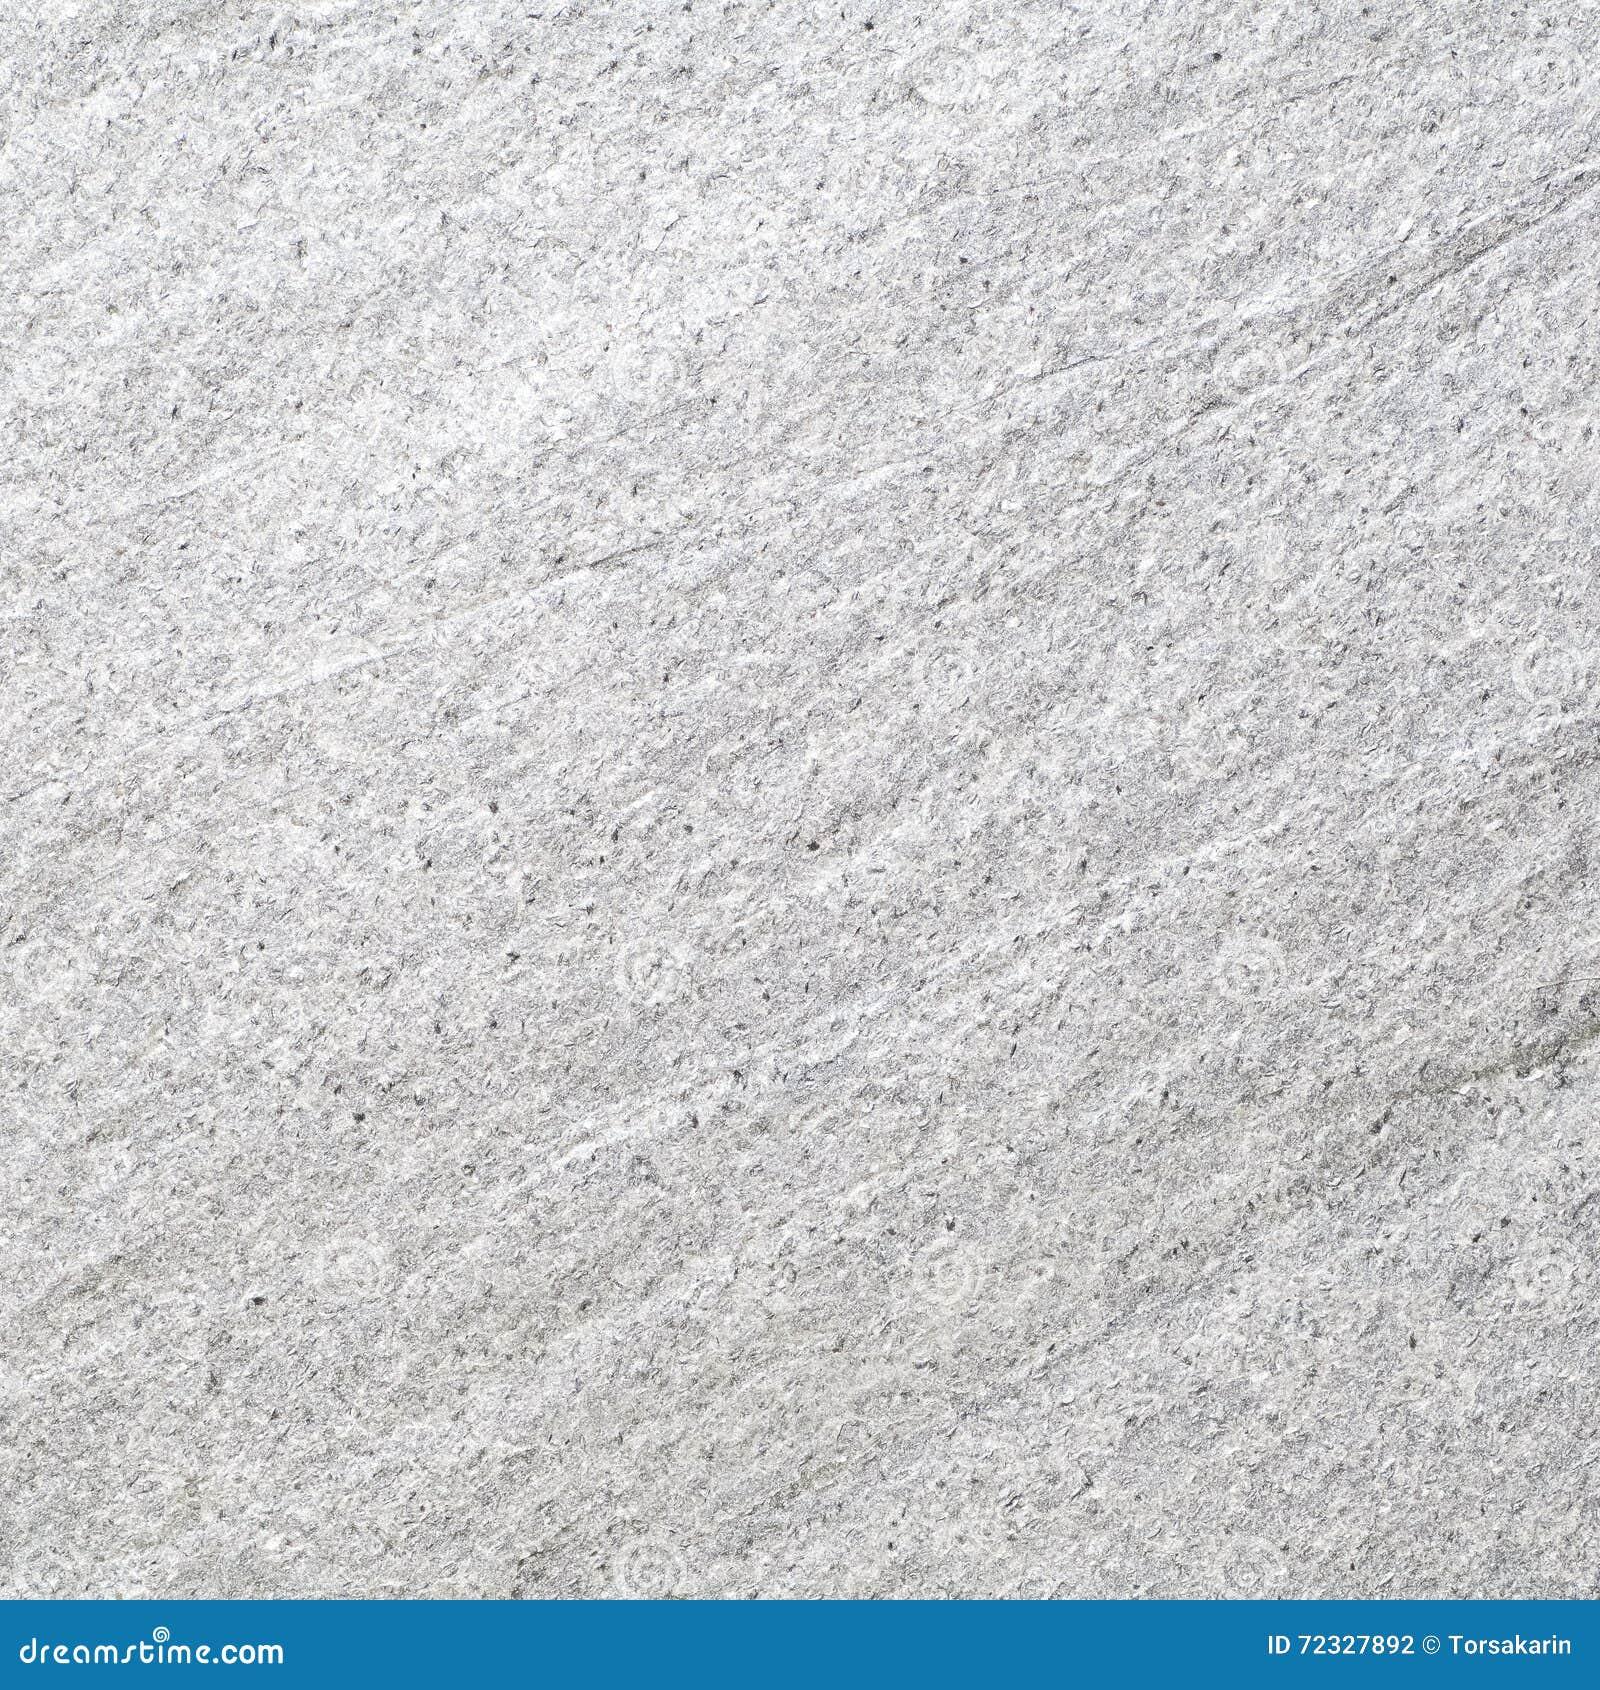 White Granite Background : Background of white granite stone stock photo image